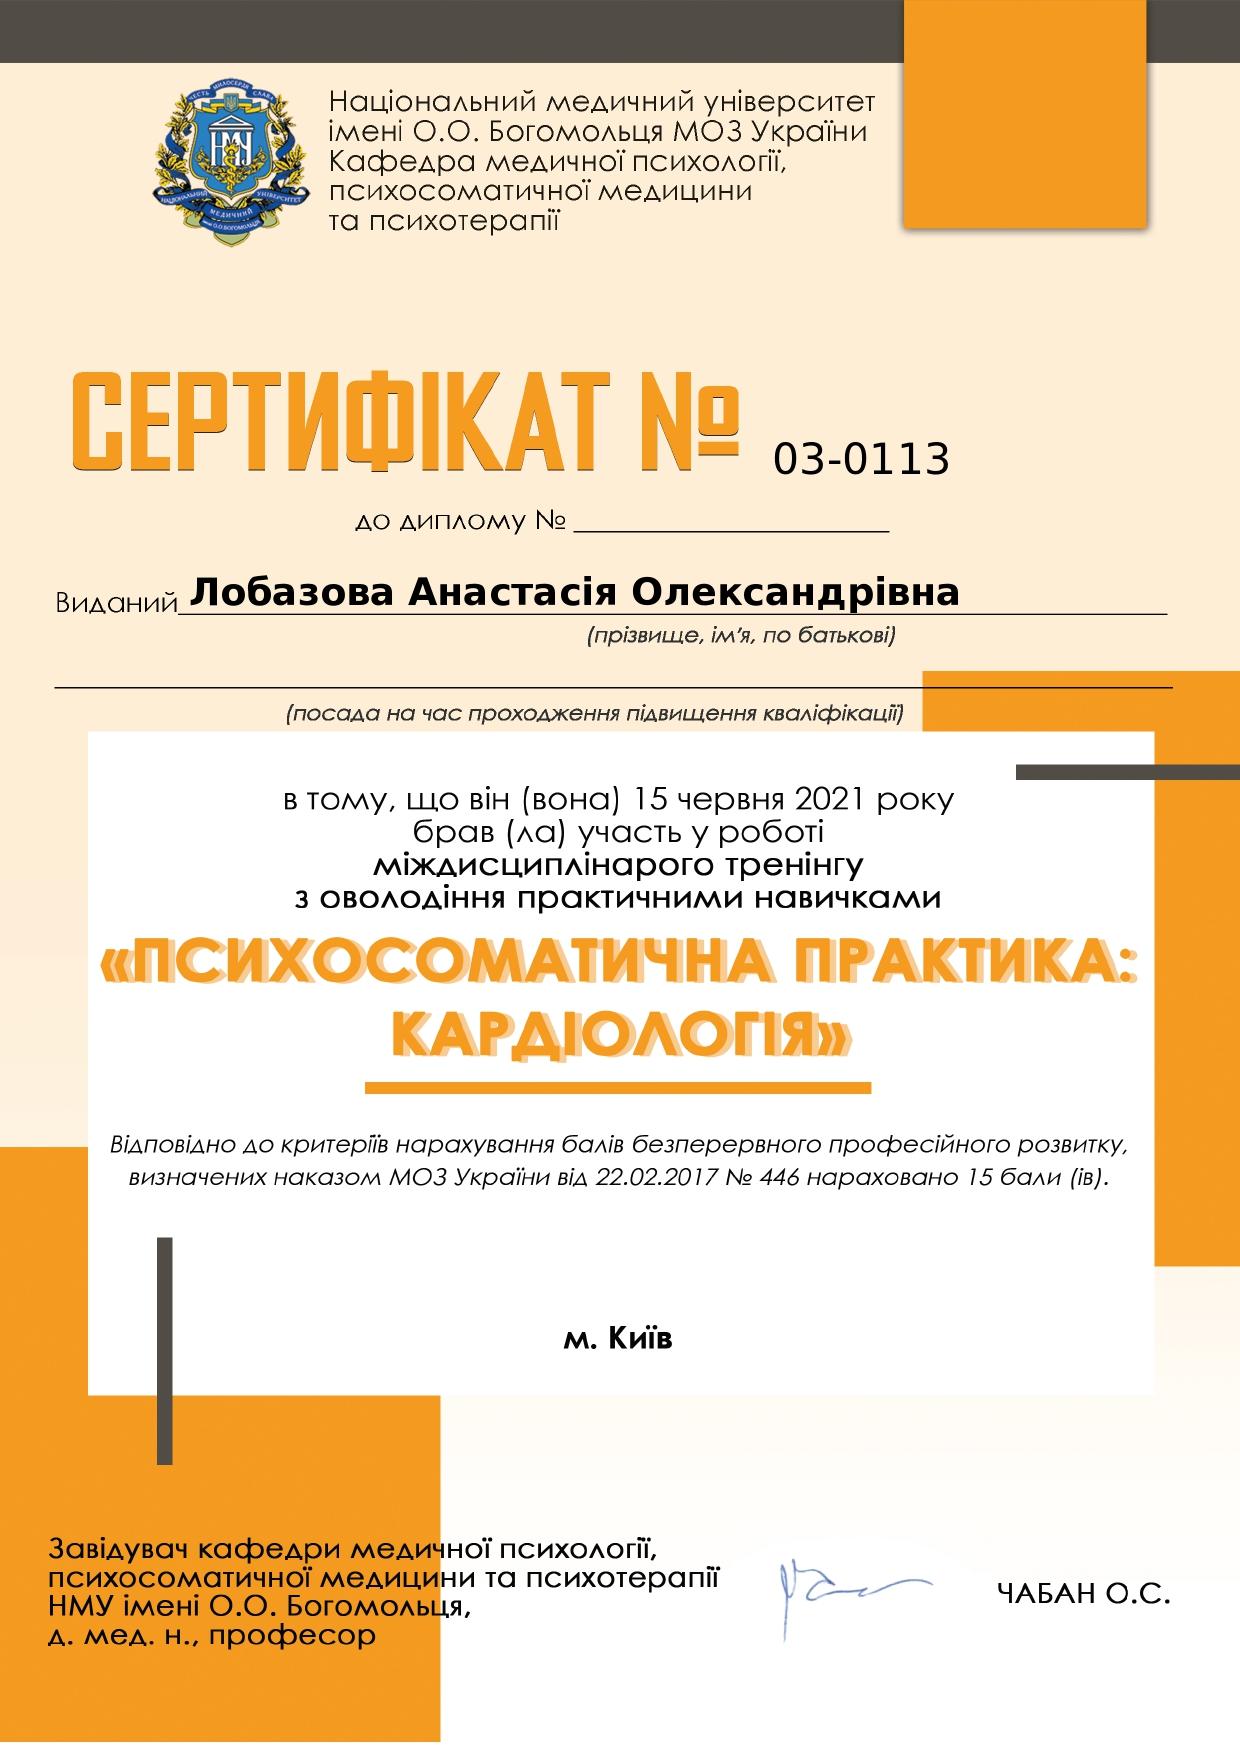 Лобазова Анастасія Олександрівна (3367761) - Certificate_page-0001